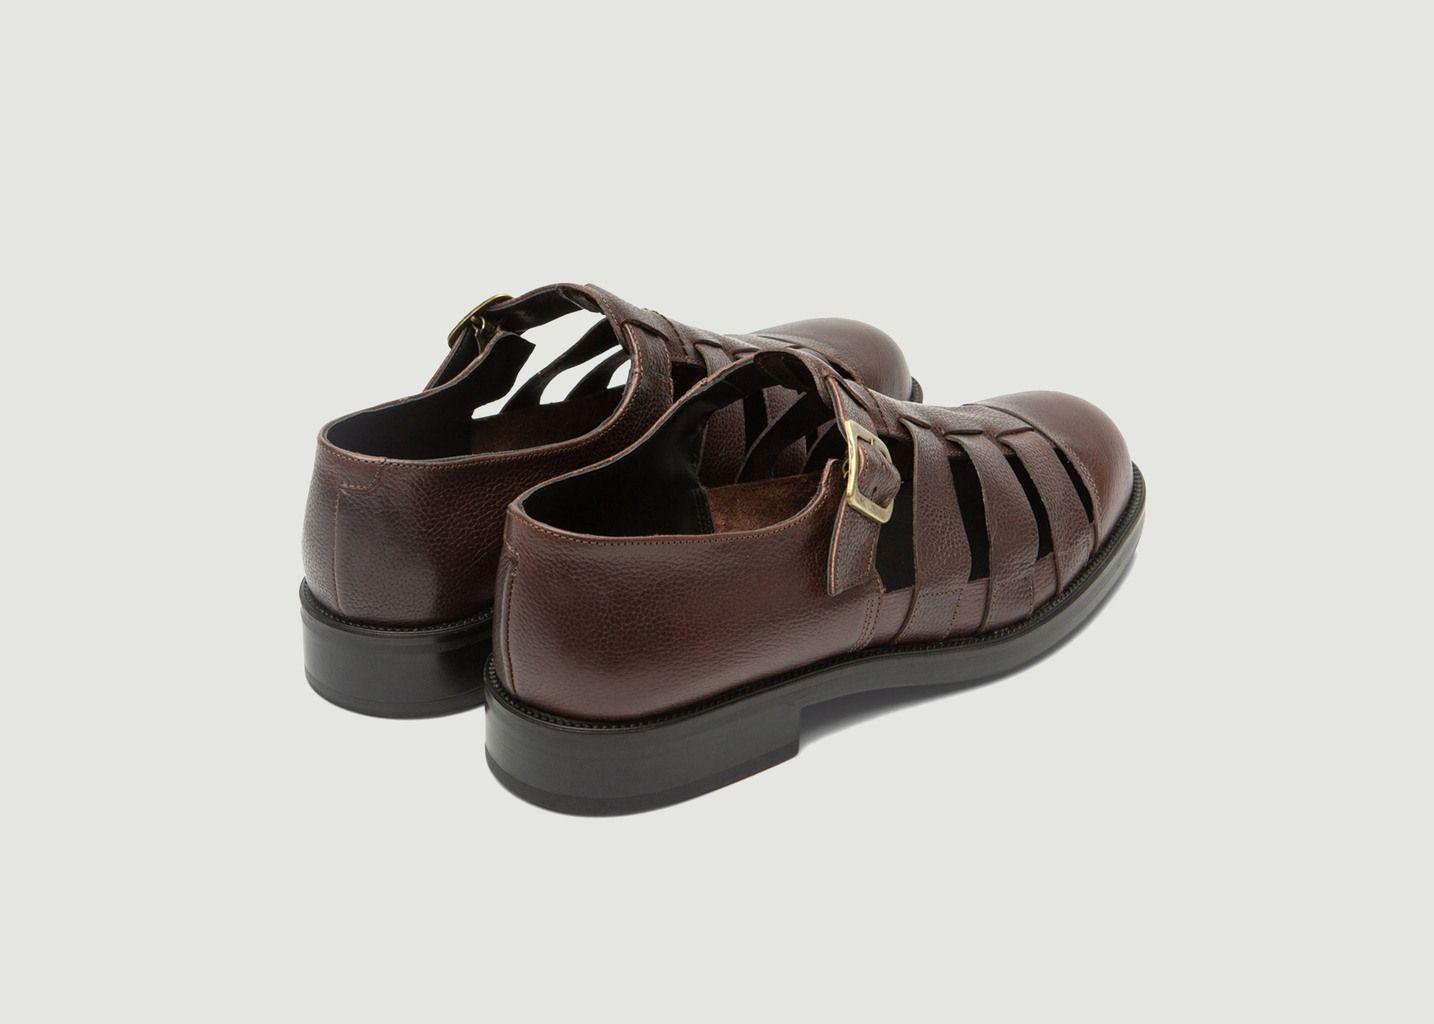 Sandales plates en cuir Dimori G - Kleman